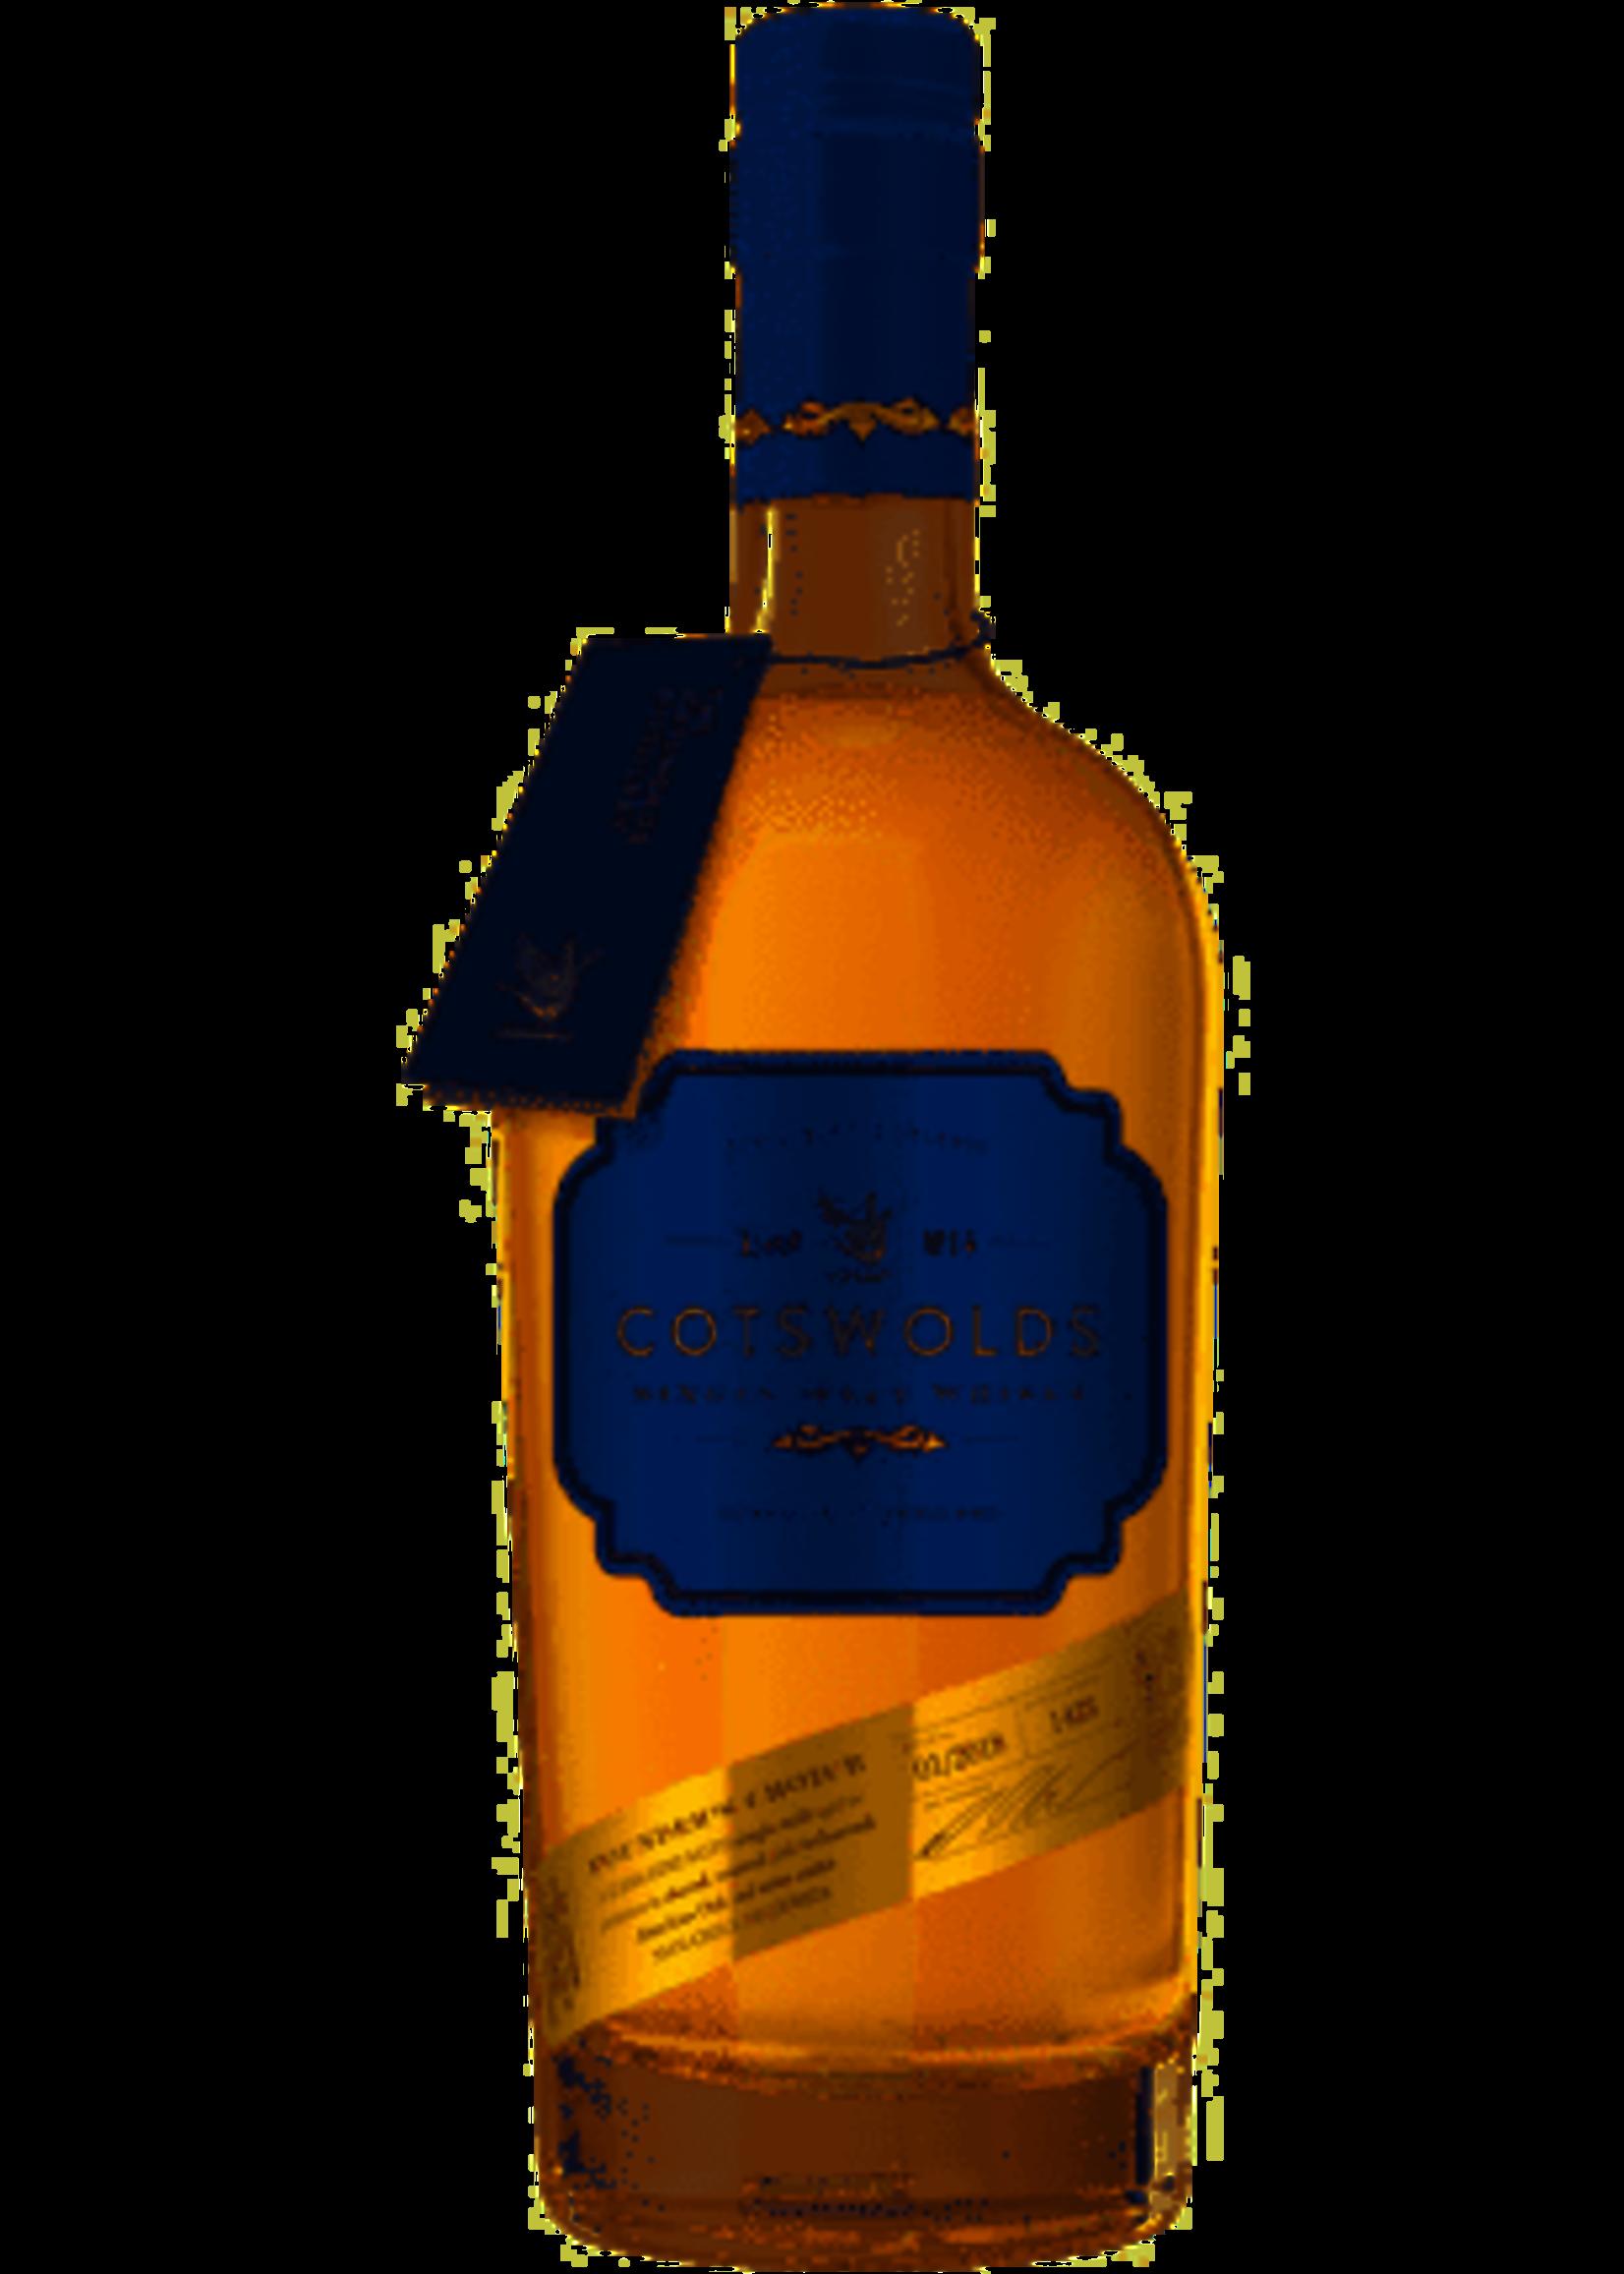 Cotswolds Distillery Cotswolds Distillery / Founder's Choice Single Malt Whiskey / 750mL